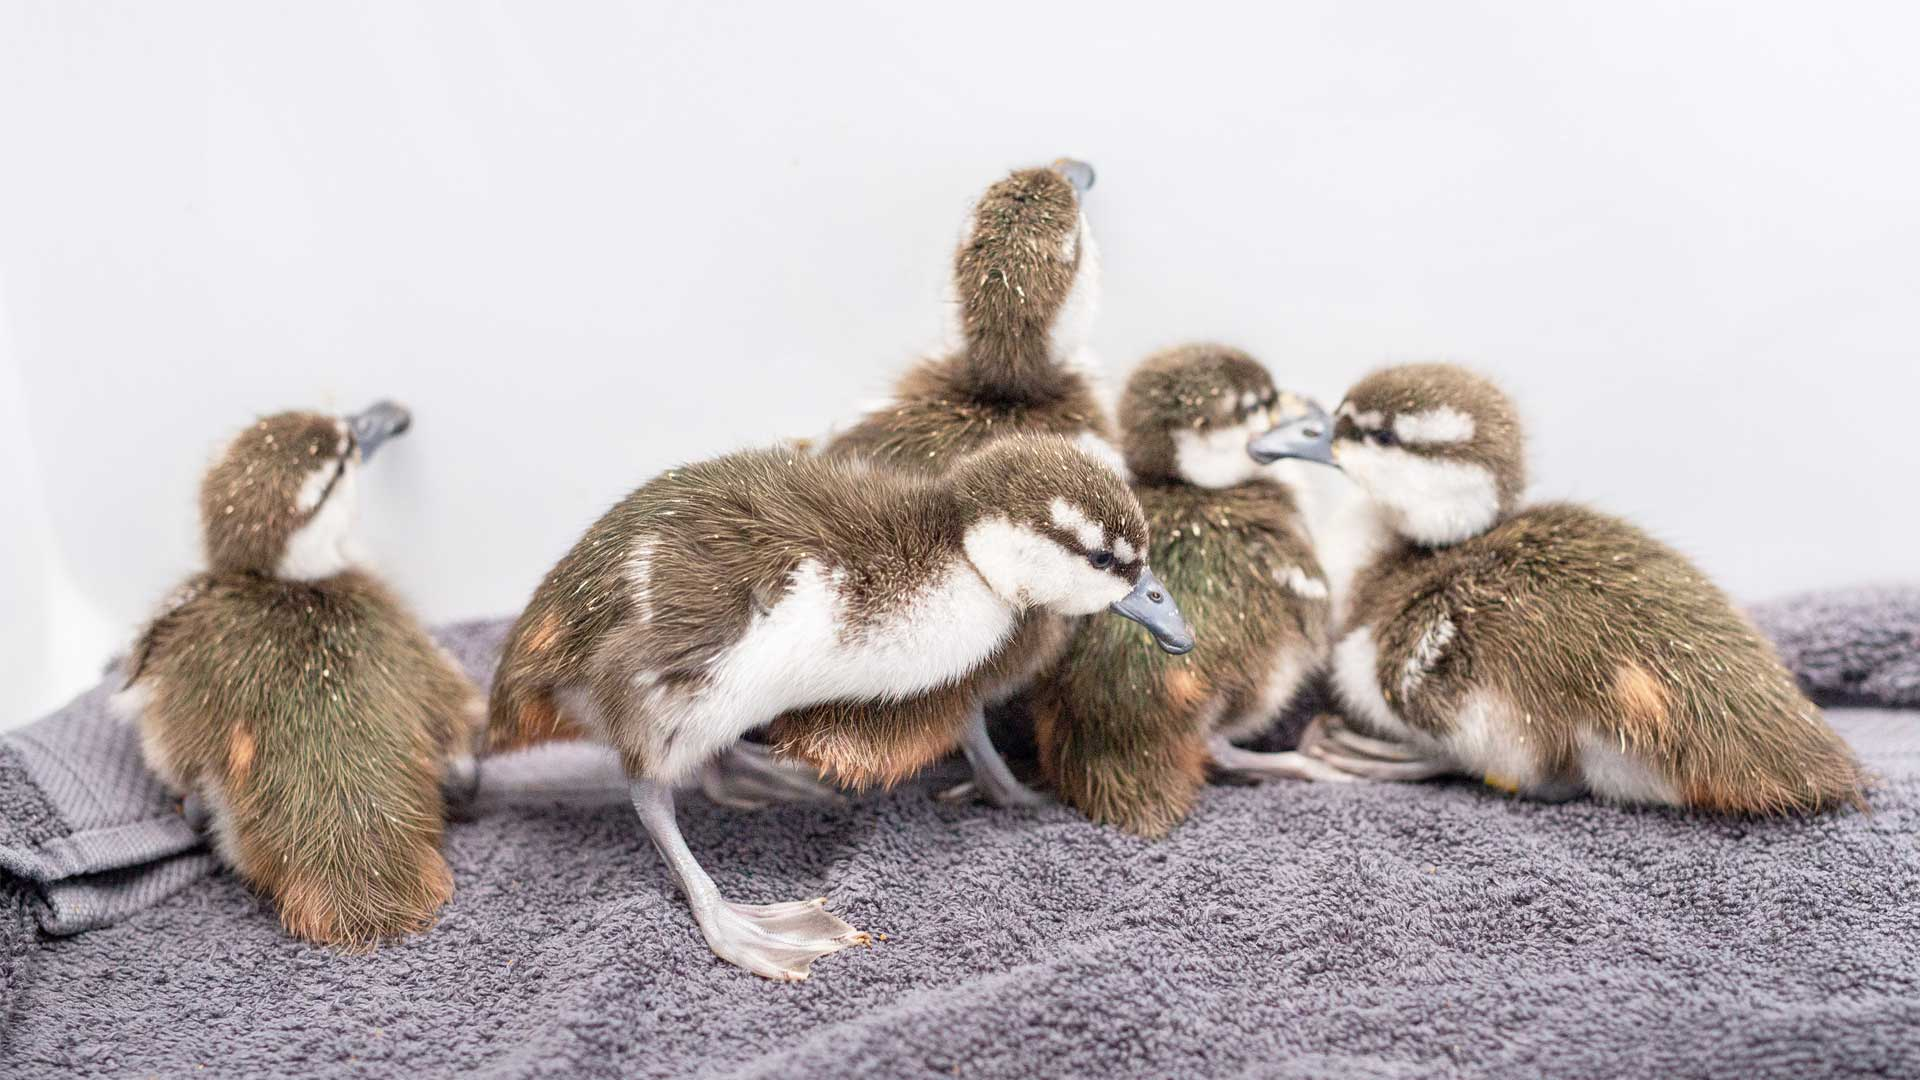 https://rfacdn.nz/zoo/assets/media/whio-duckling-gallery-9.jpg